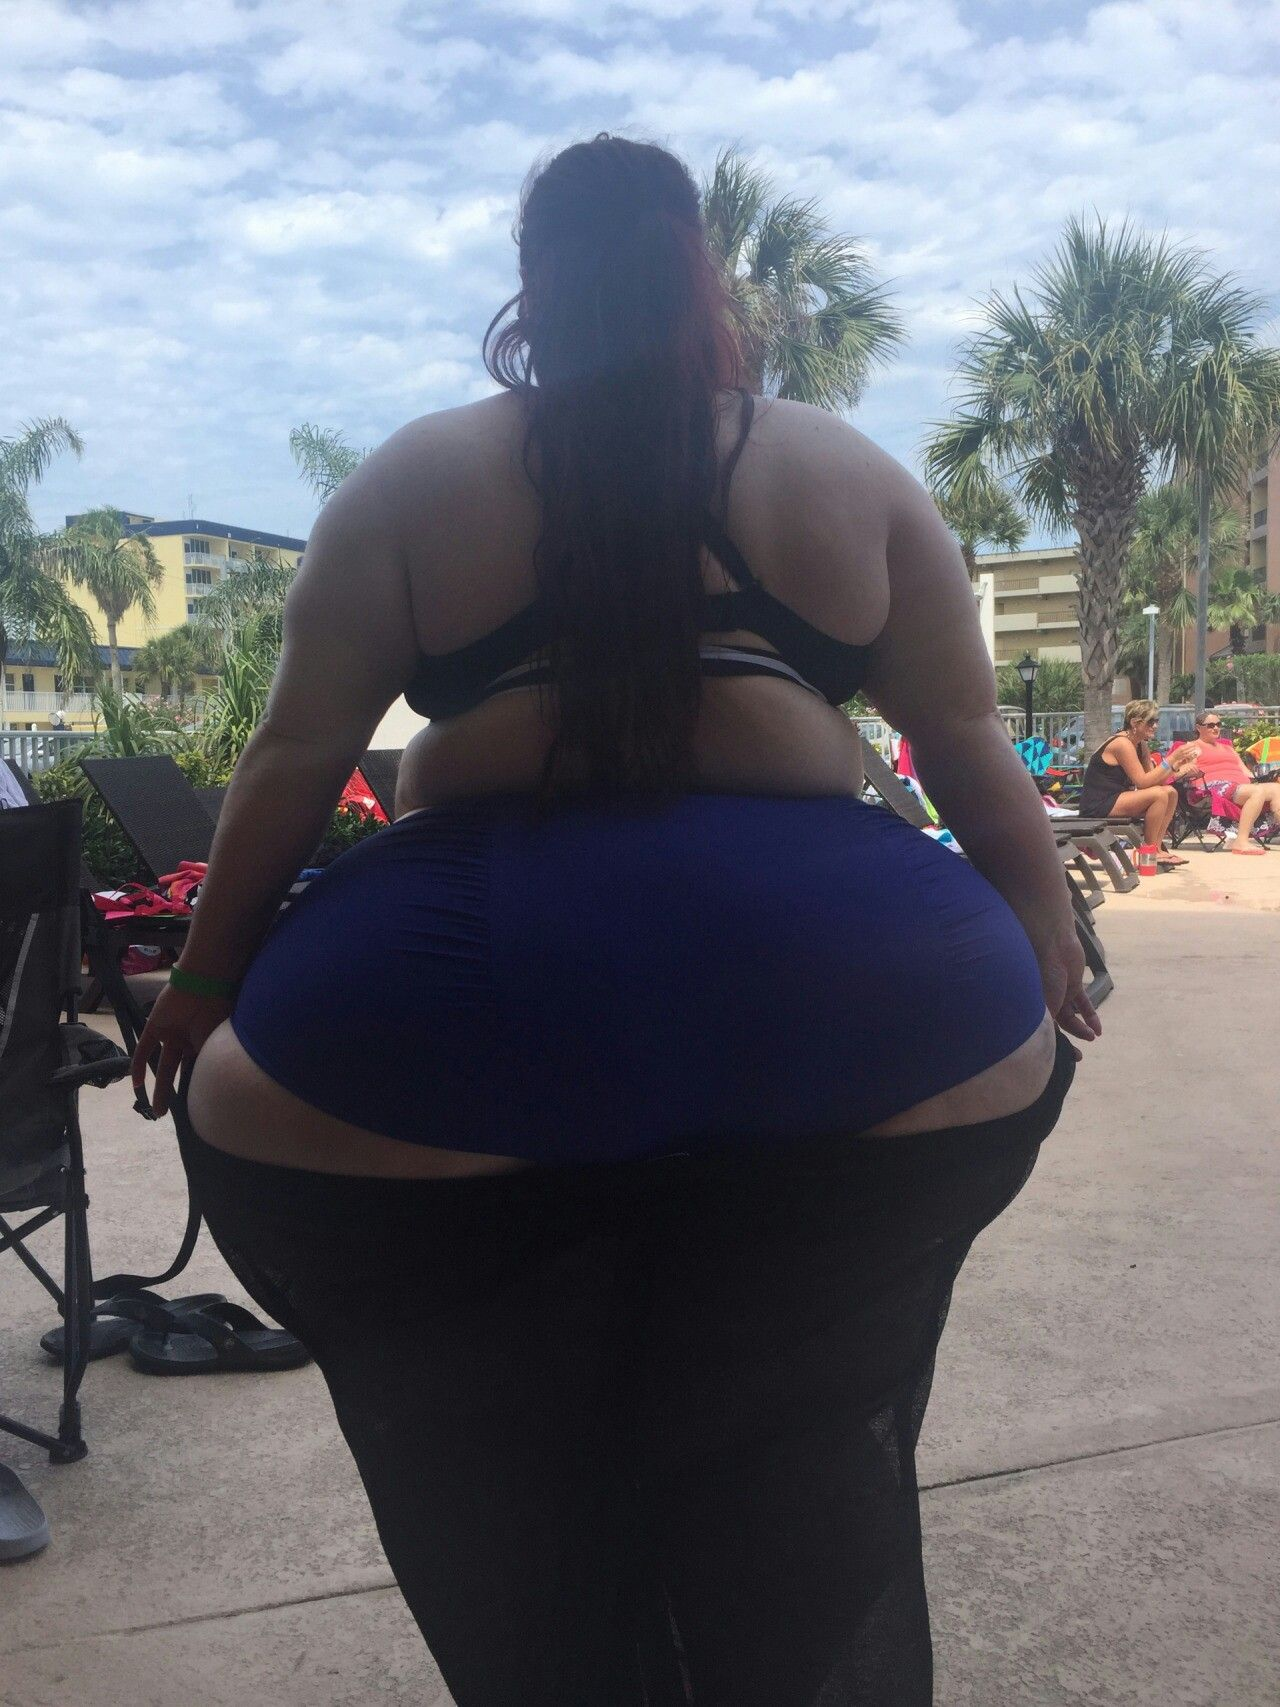 Big donkey booty miss hydro - 2 4